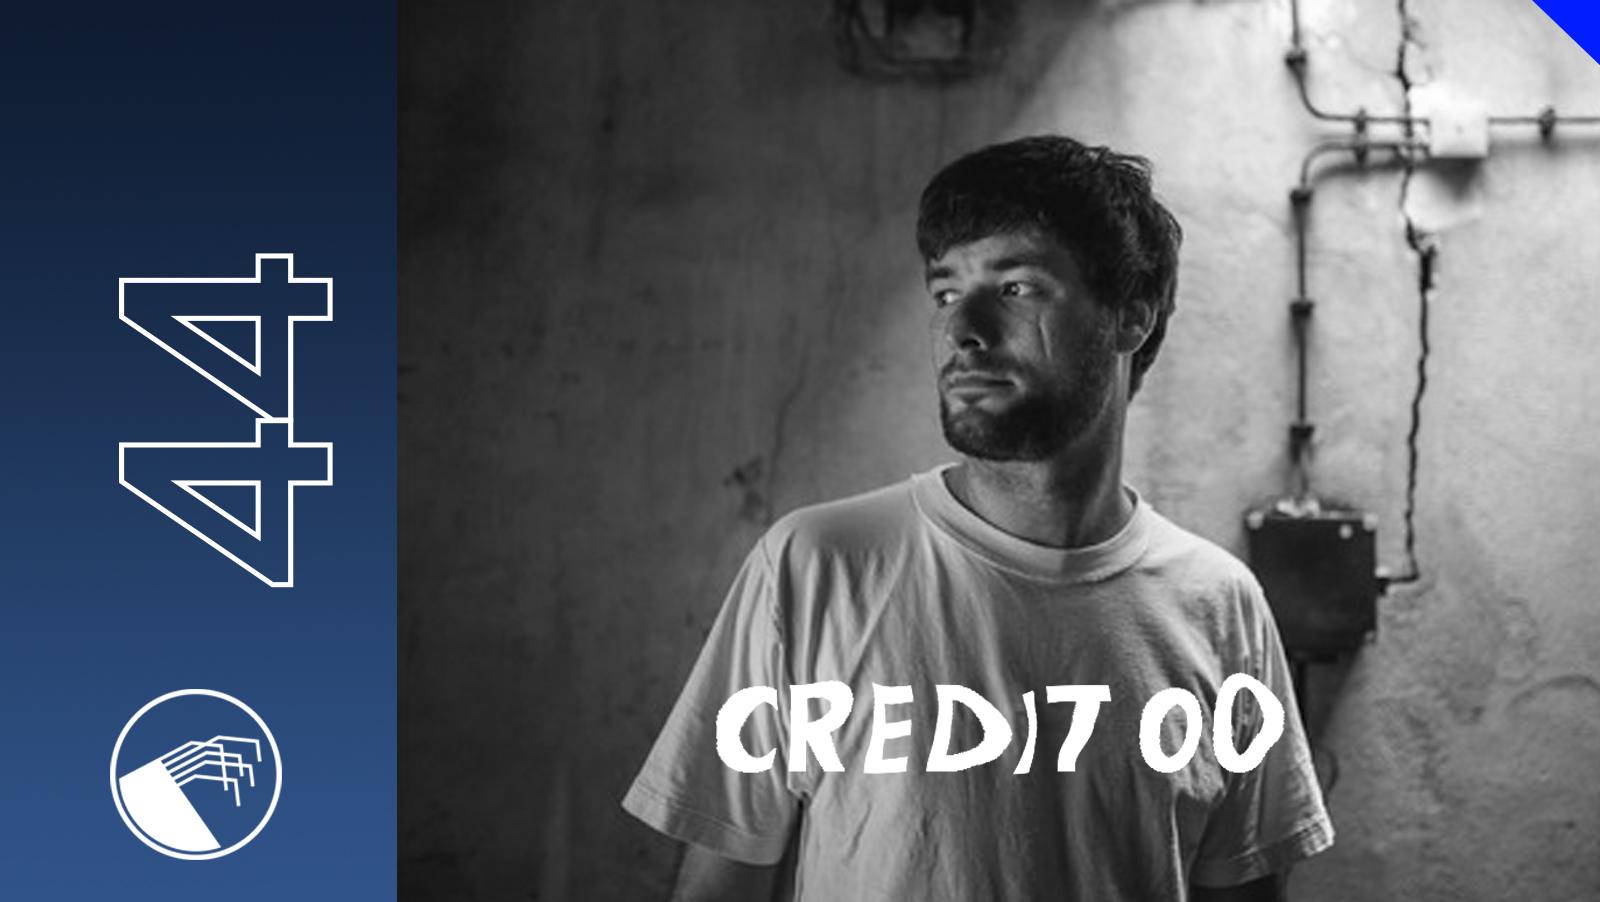 044 Credit 00